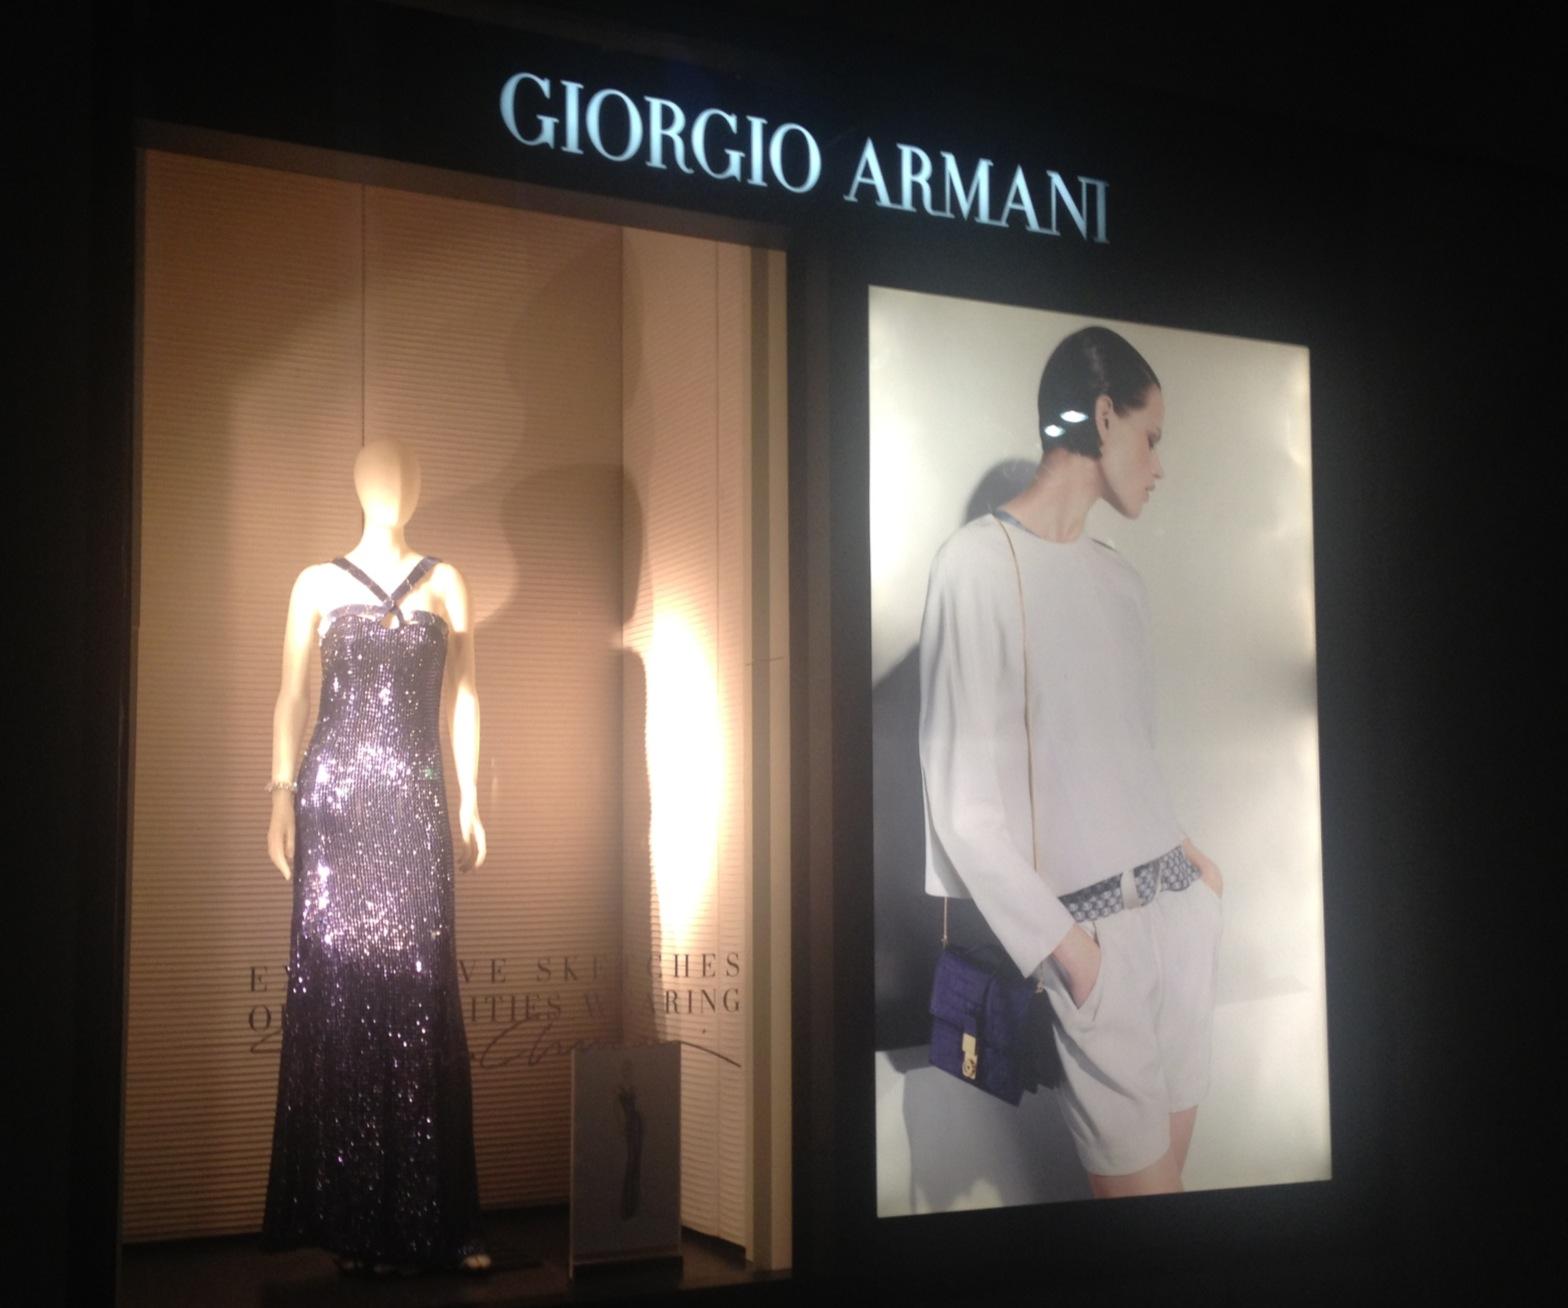 Armani window